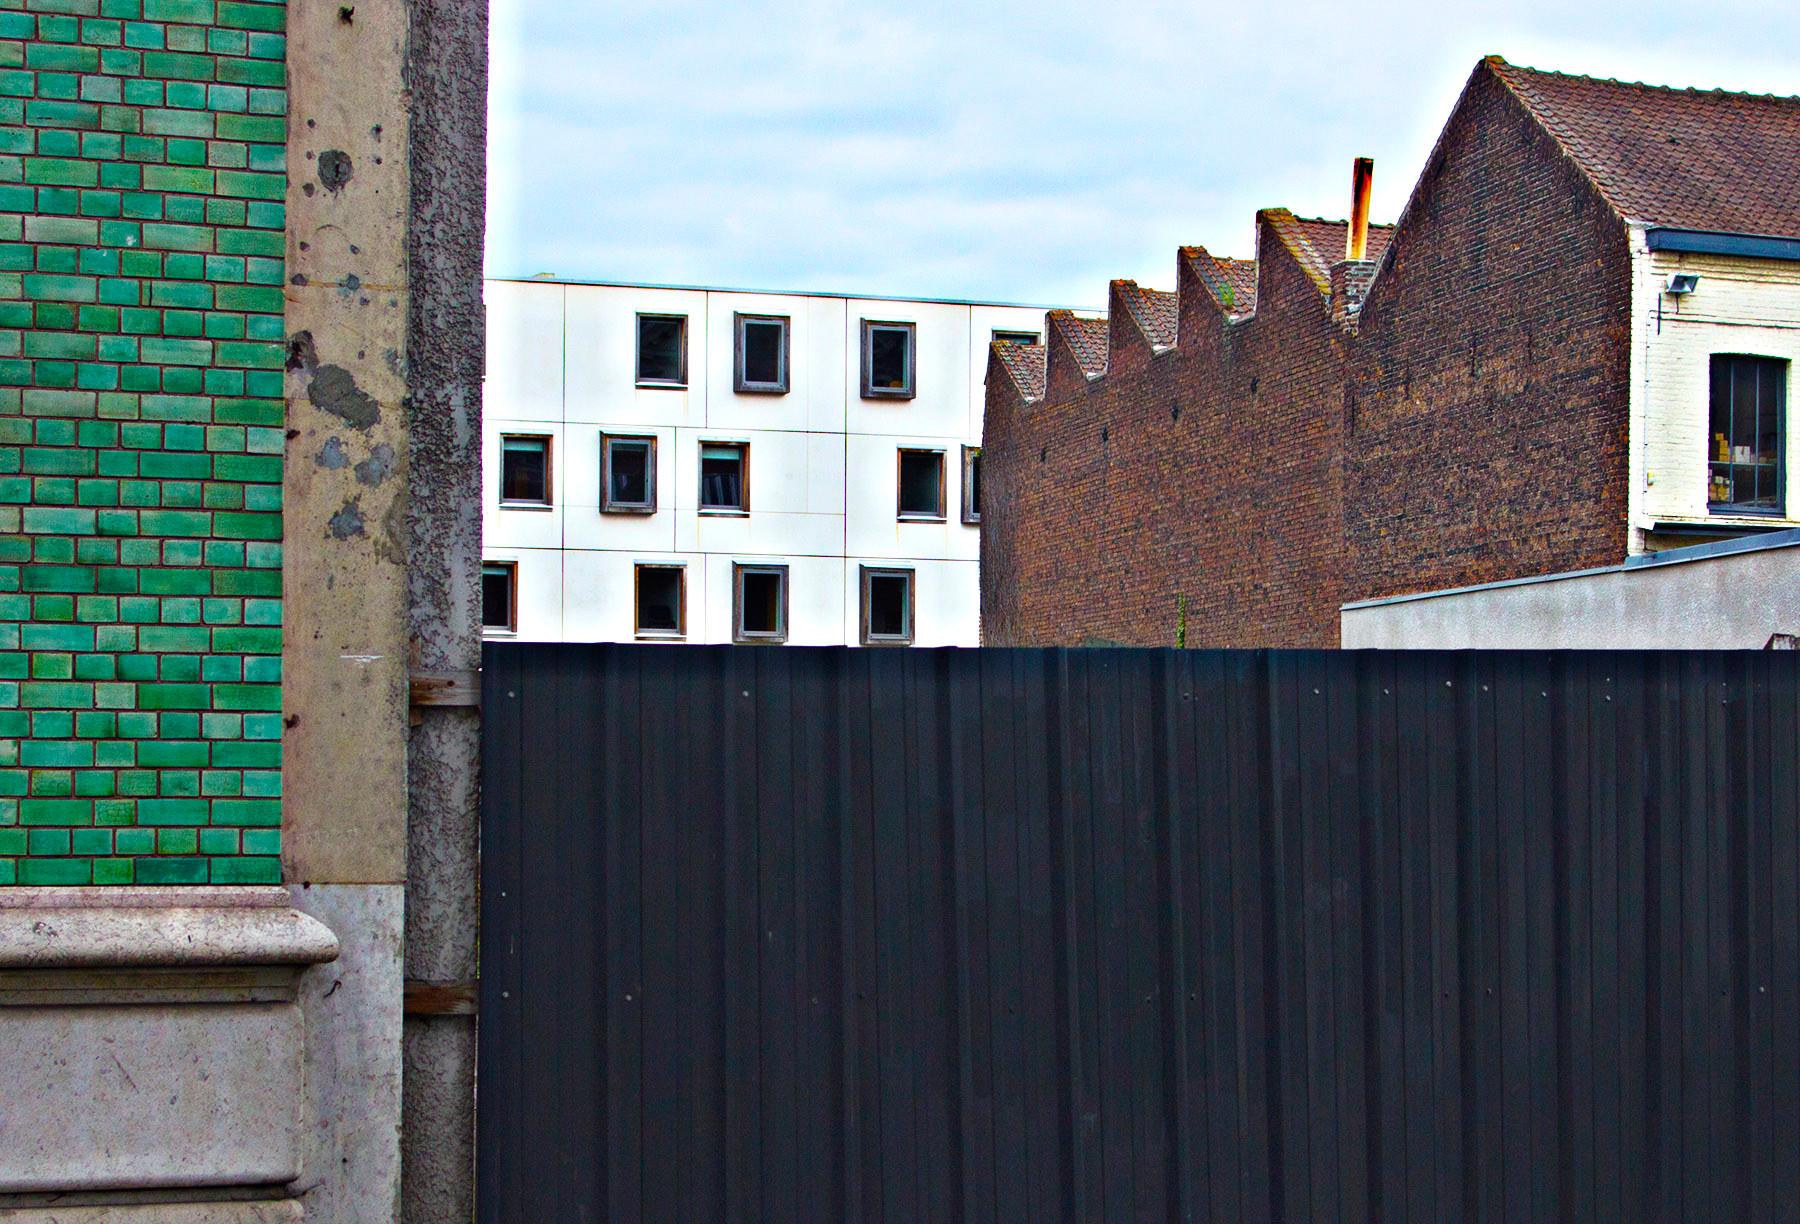 Architextures.